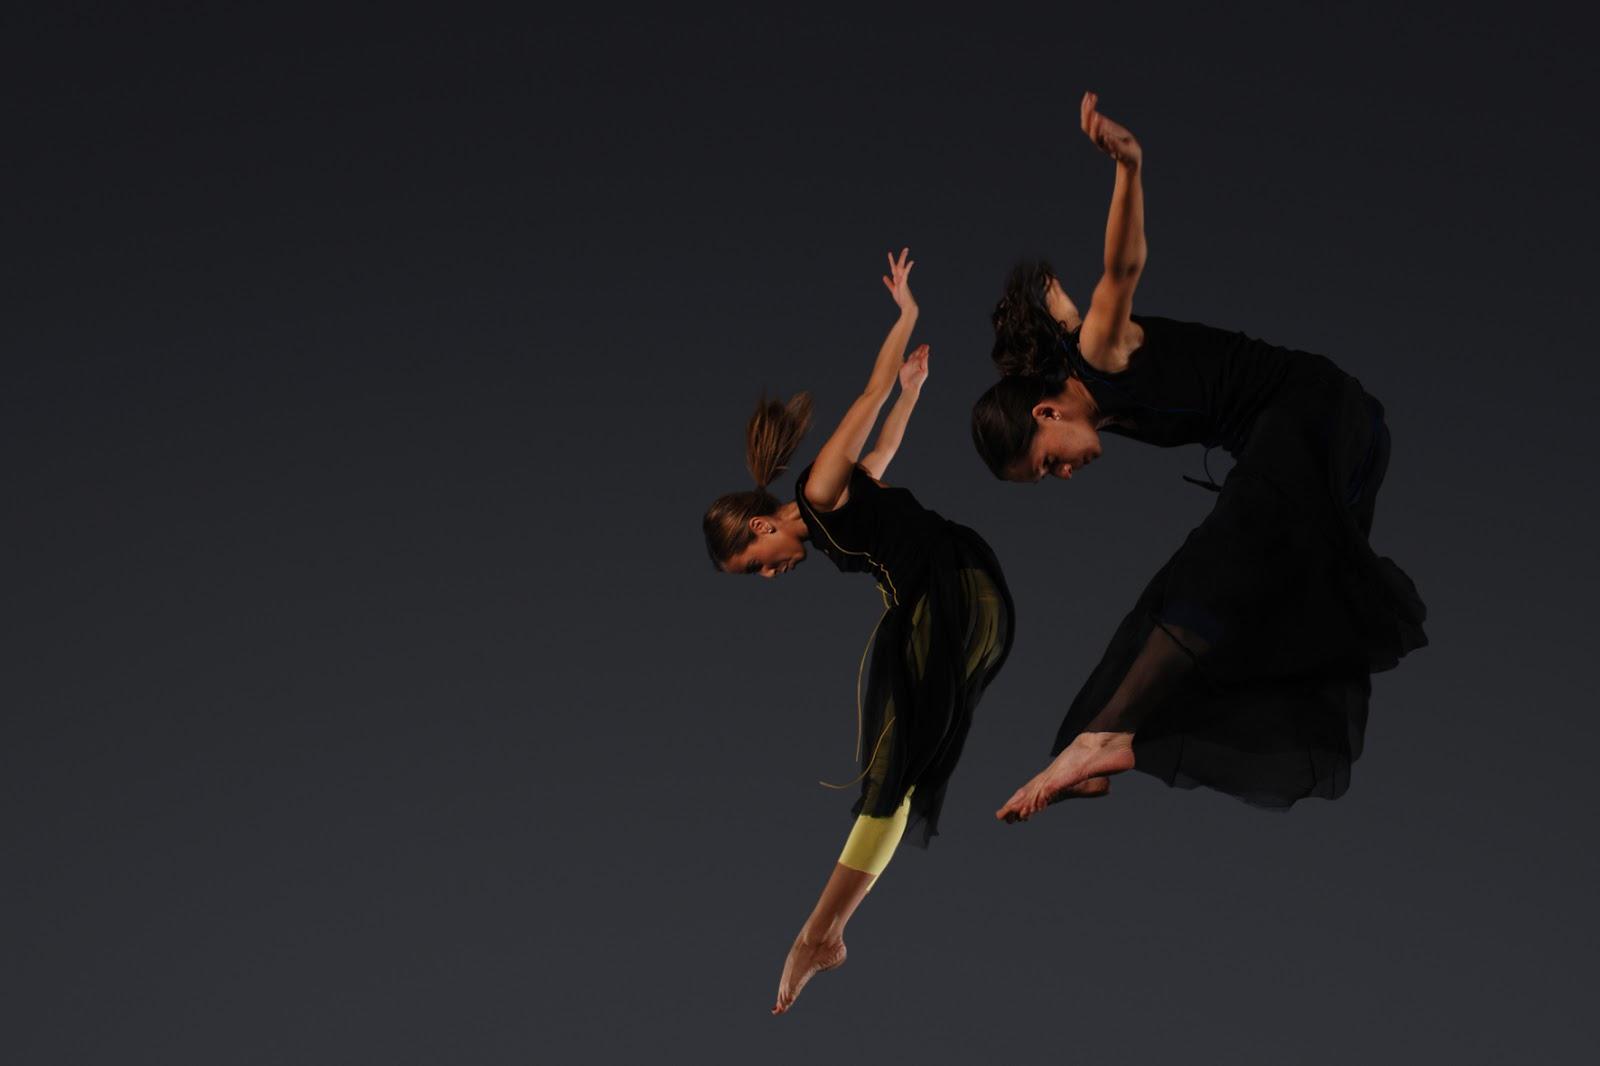 ANATOMIA DEL MOVIMIENTO | anatomia del movimiento